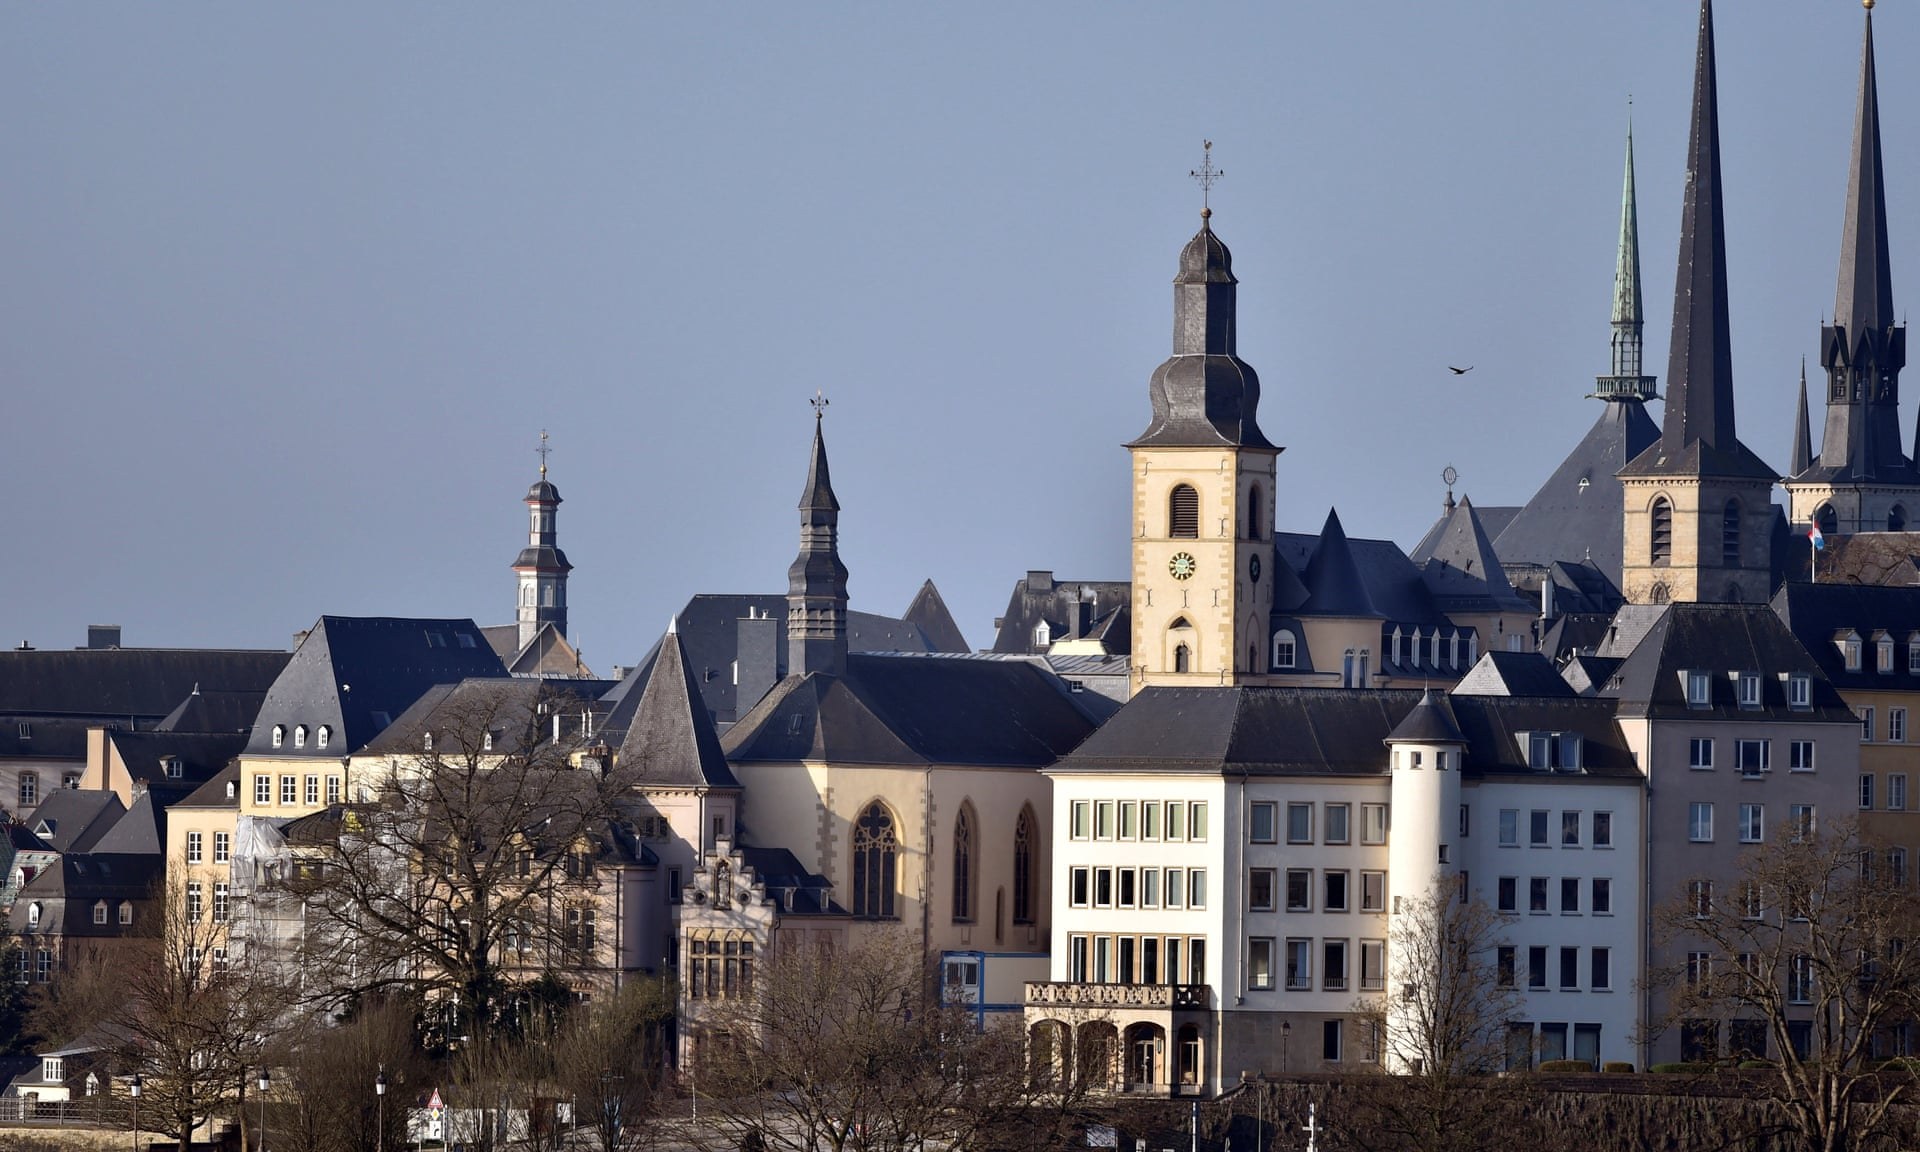 Dal 2020 in Lussemburgo tutti i trasporti pubblici saranno gratis